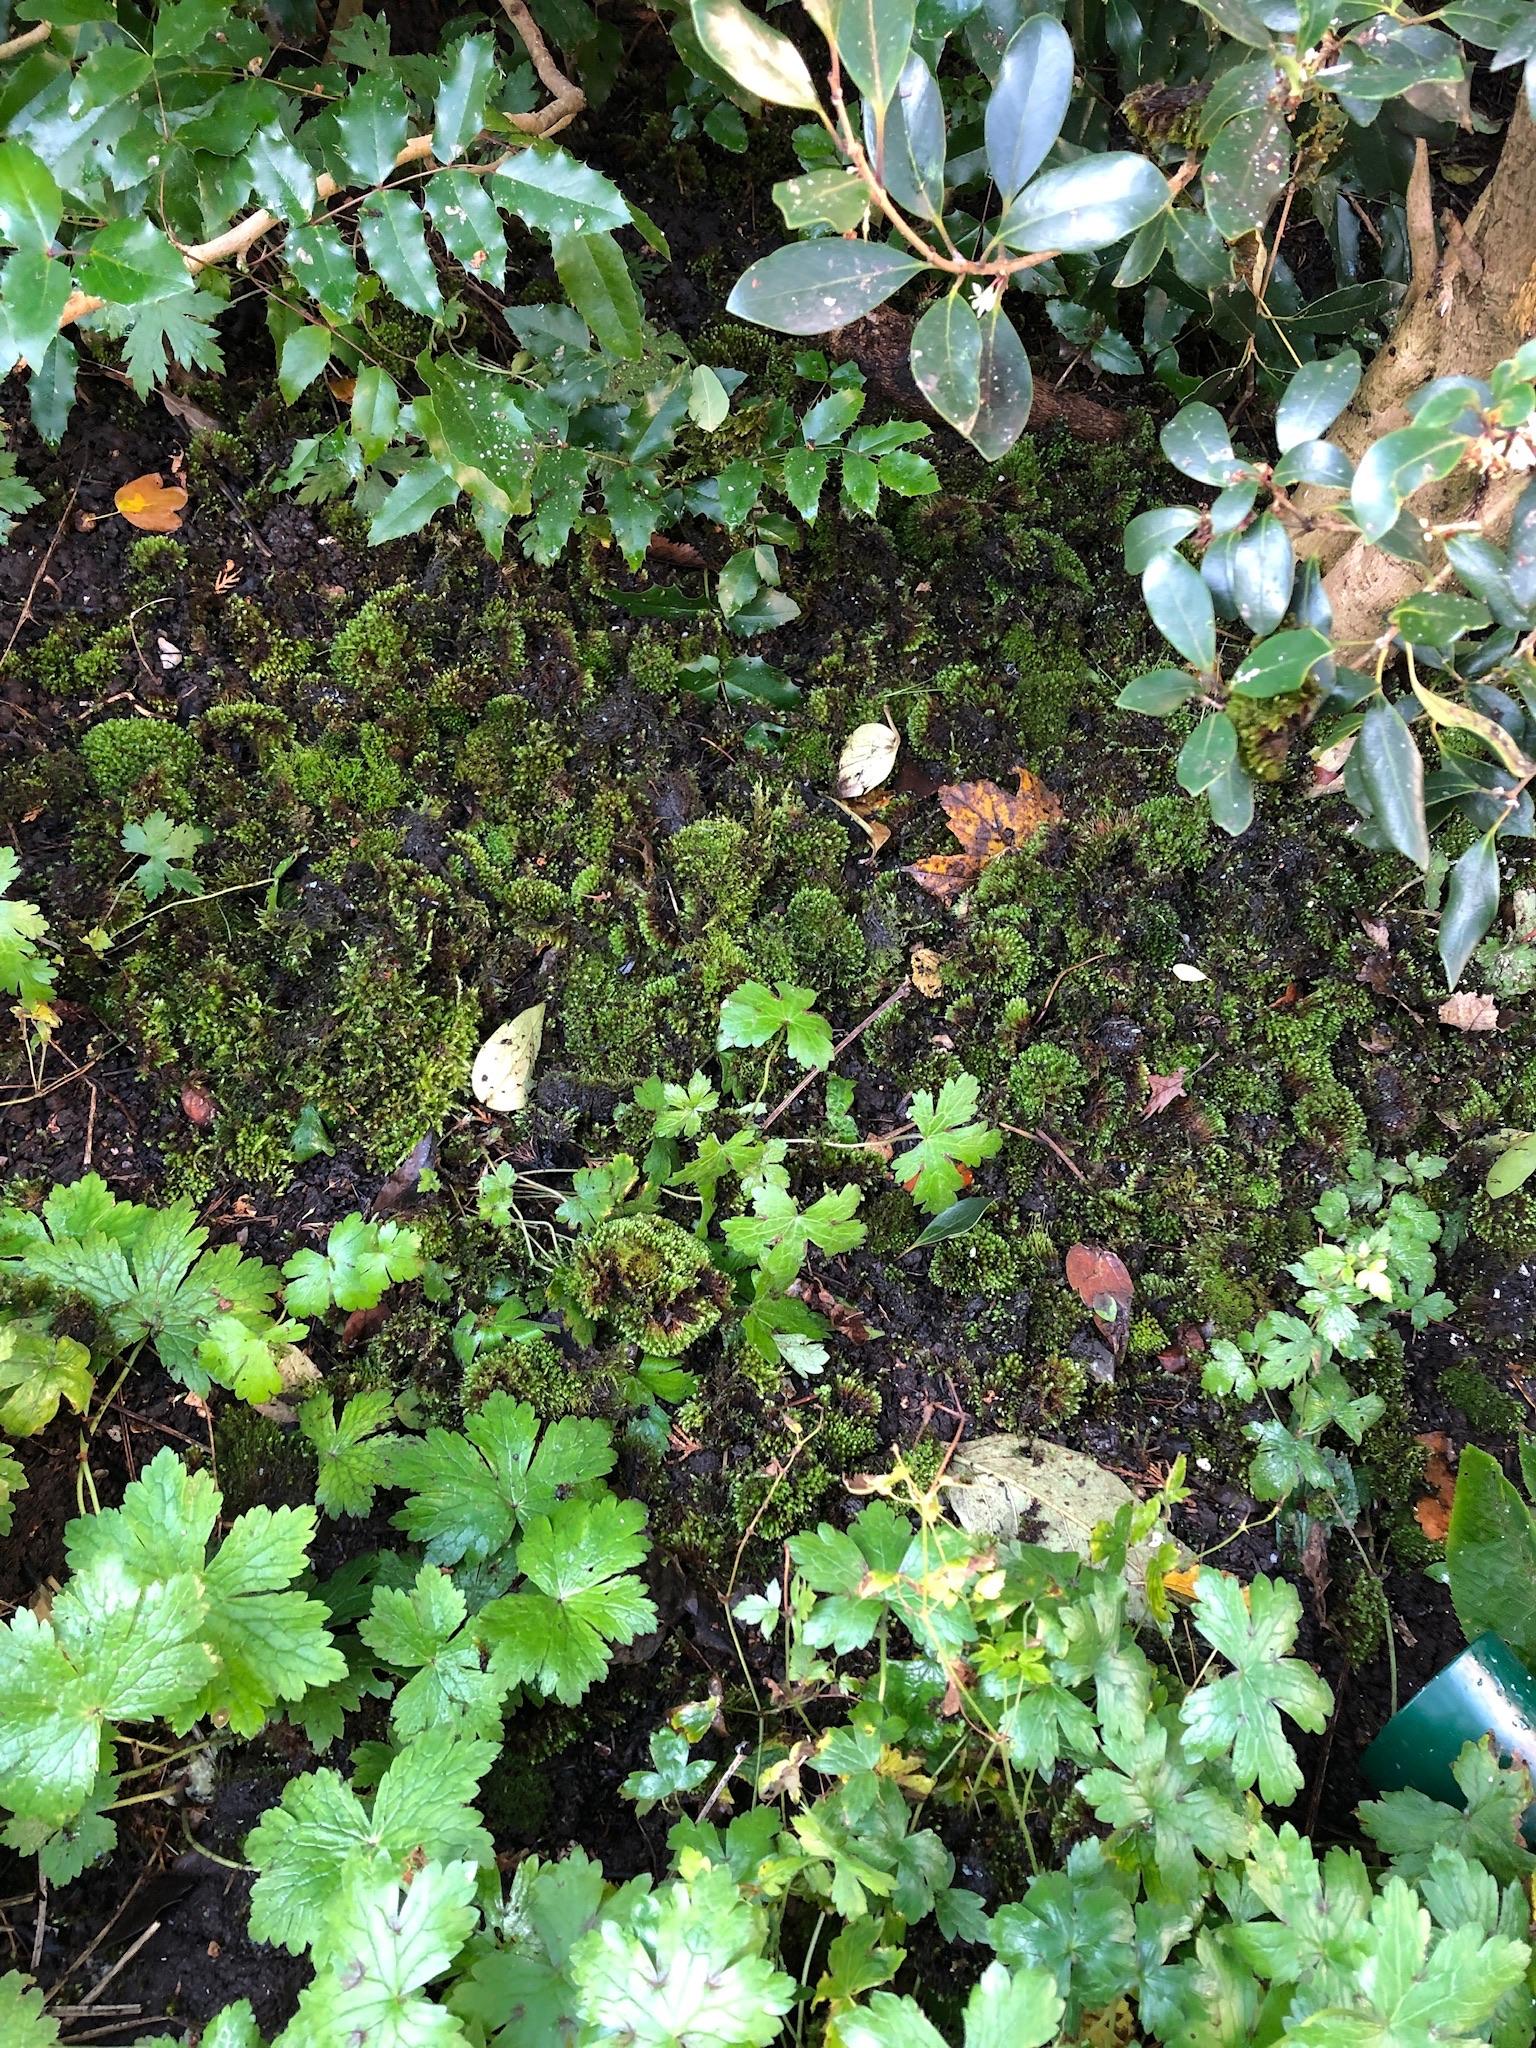 Moss in a cottage garden